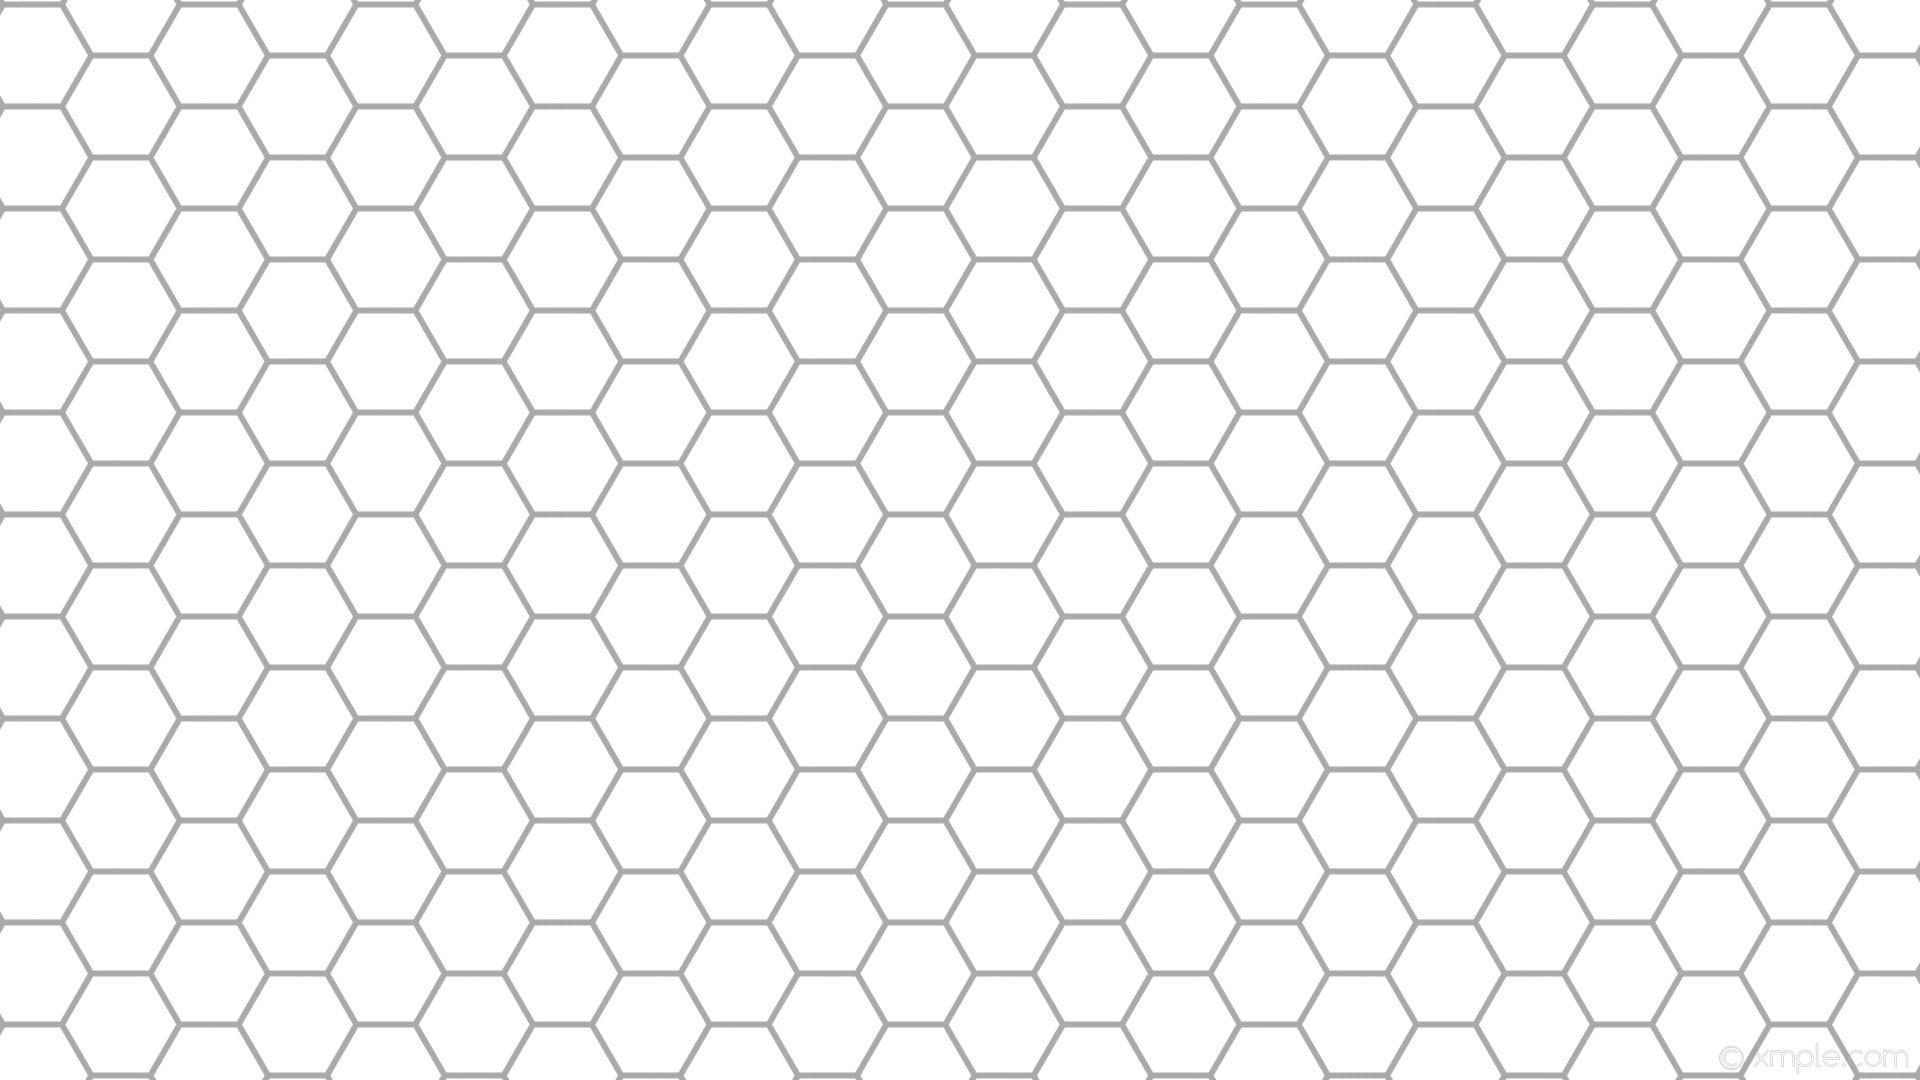 wallpaper beehive hexagon white honeycomb grey dark gray #ffffff #a9a9a9  diagonal 30° 6px